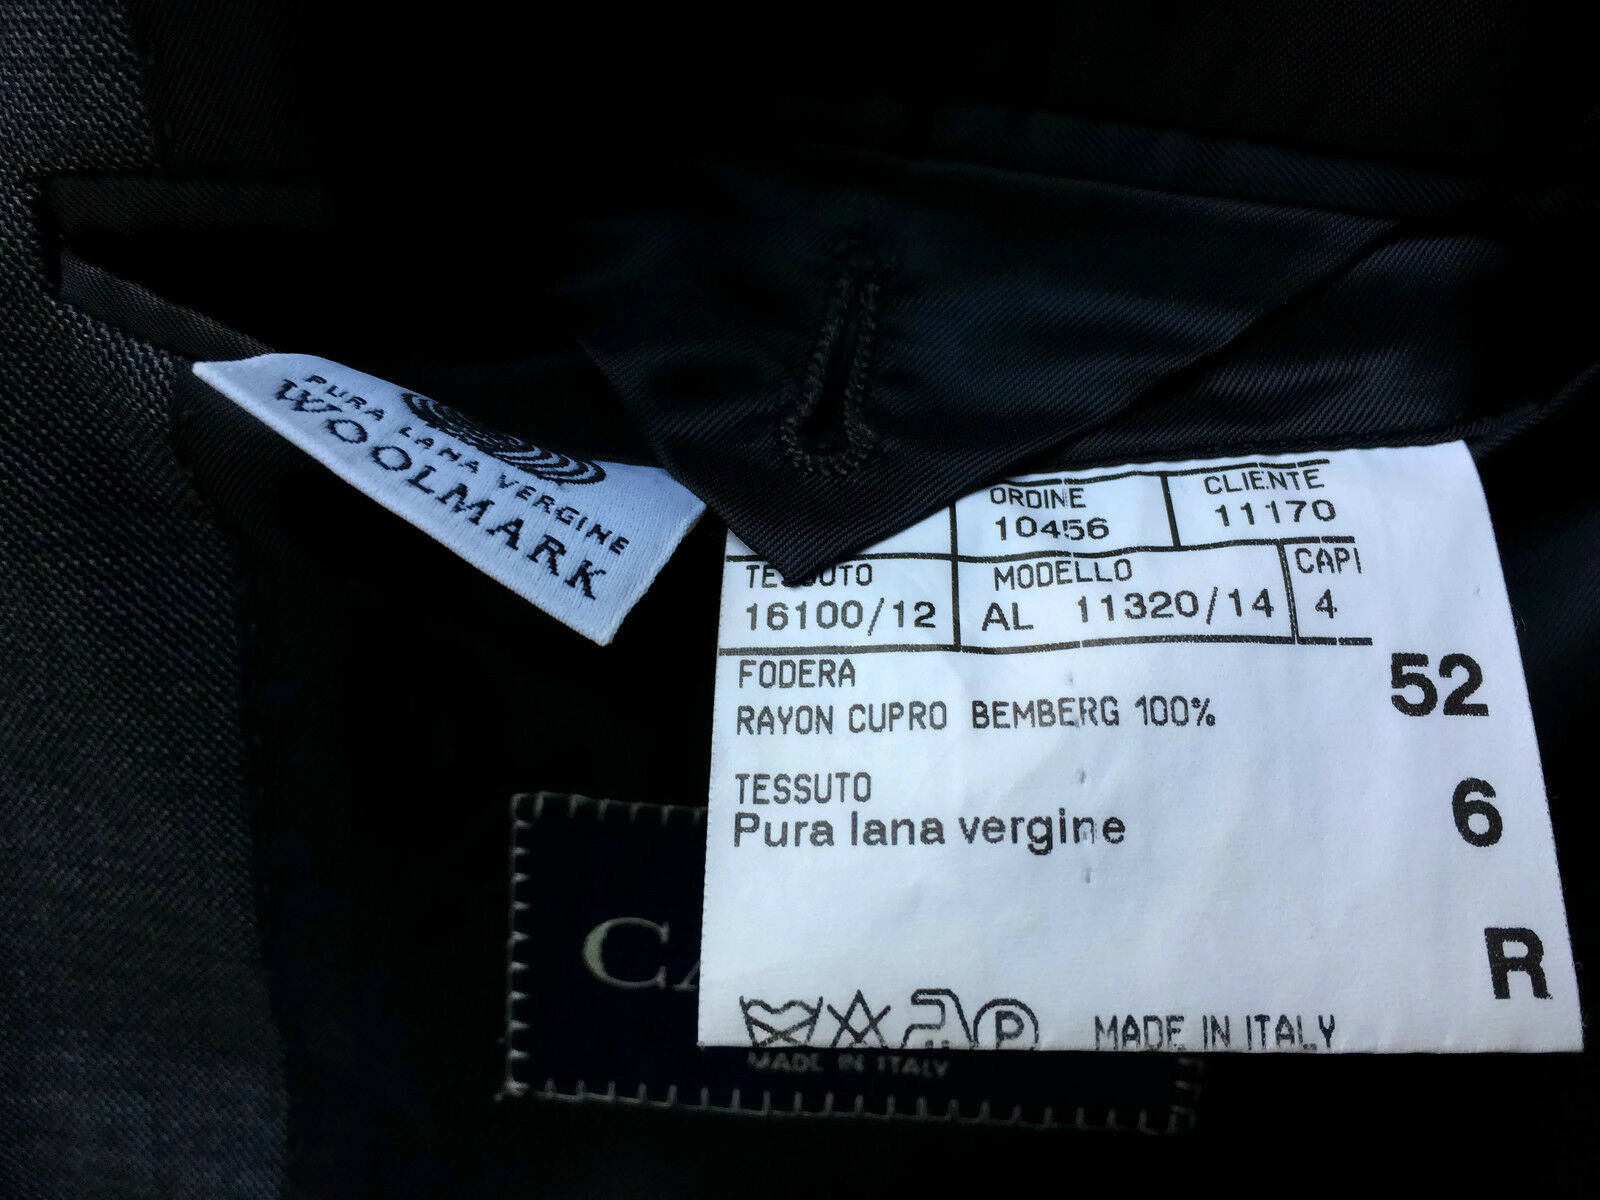 Canali; uomo Giacca Super 120's LANA VERGINE GRIGIO GRIGIO VERGINE TG. 52 R  NUOVO 84503f